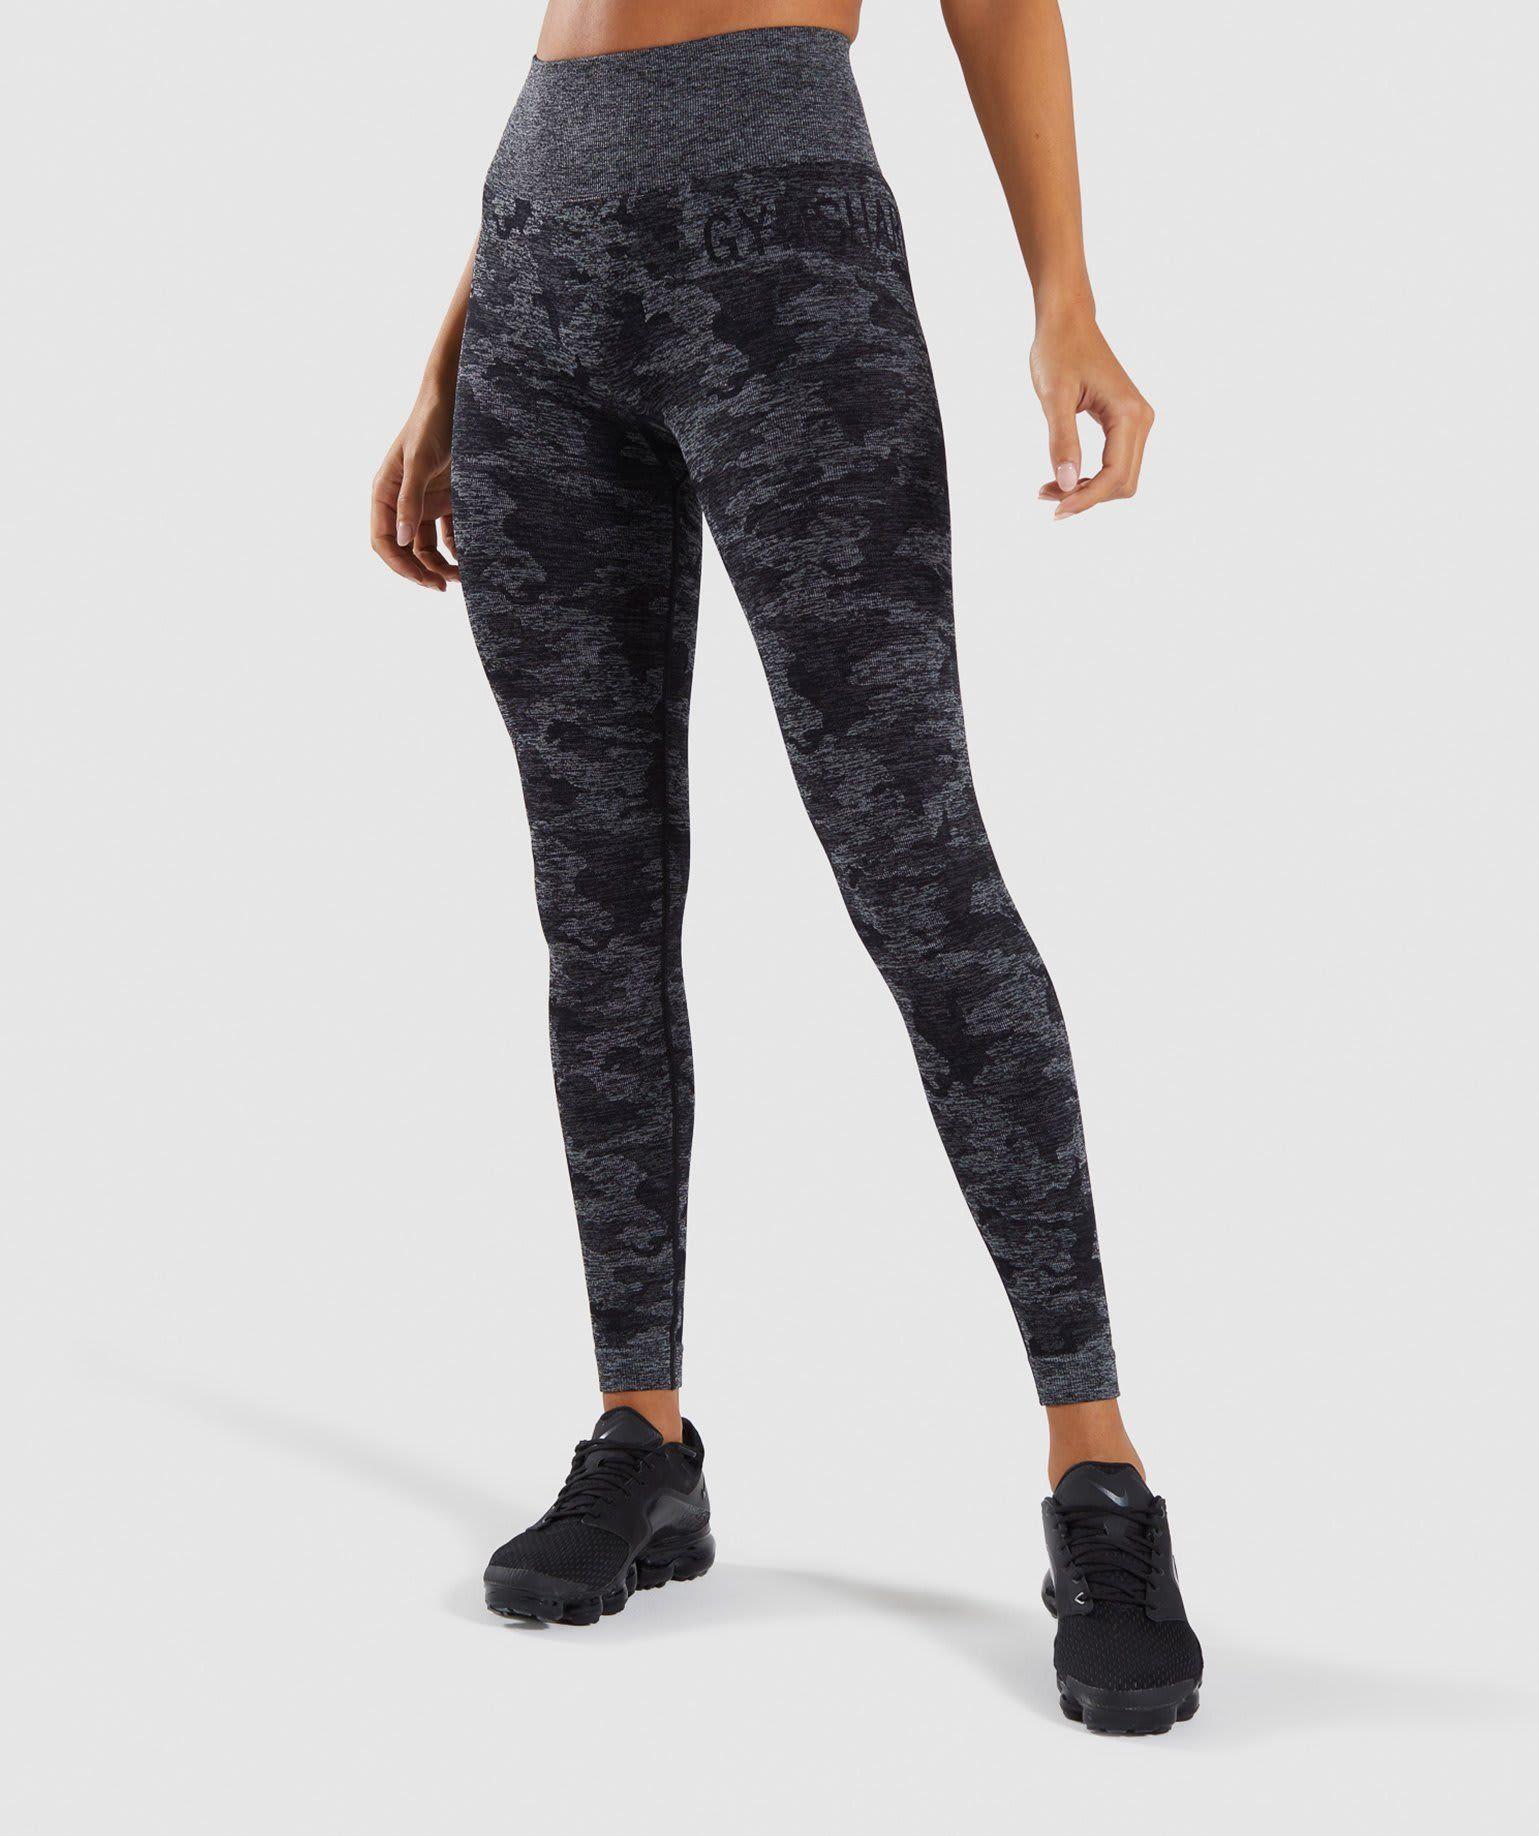 Gymshark Adapt Camo Seamless Leggings - Black